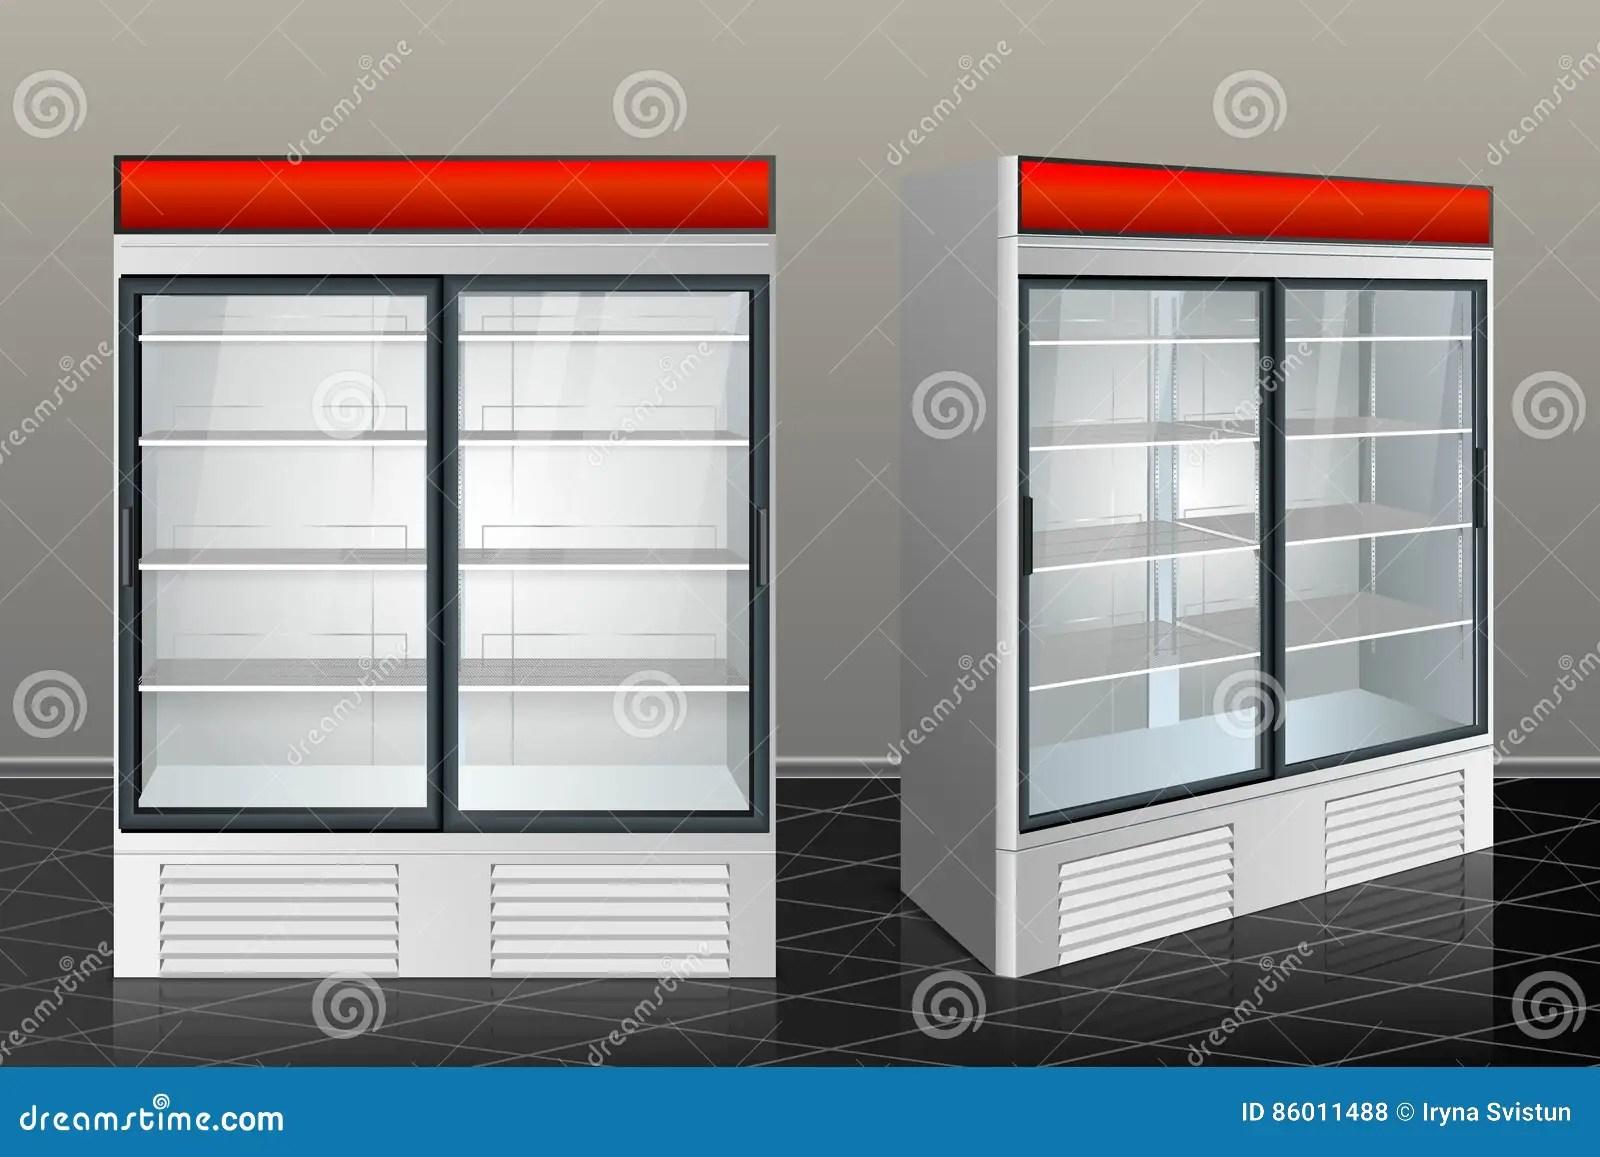 kitchen showrooms budget cabinets 冰箱陈列室厨房库存例证 插画包括有产品 饮食 传感器 查出 磁铁 冰箱陈列室厨房